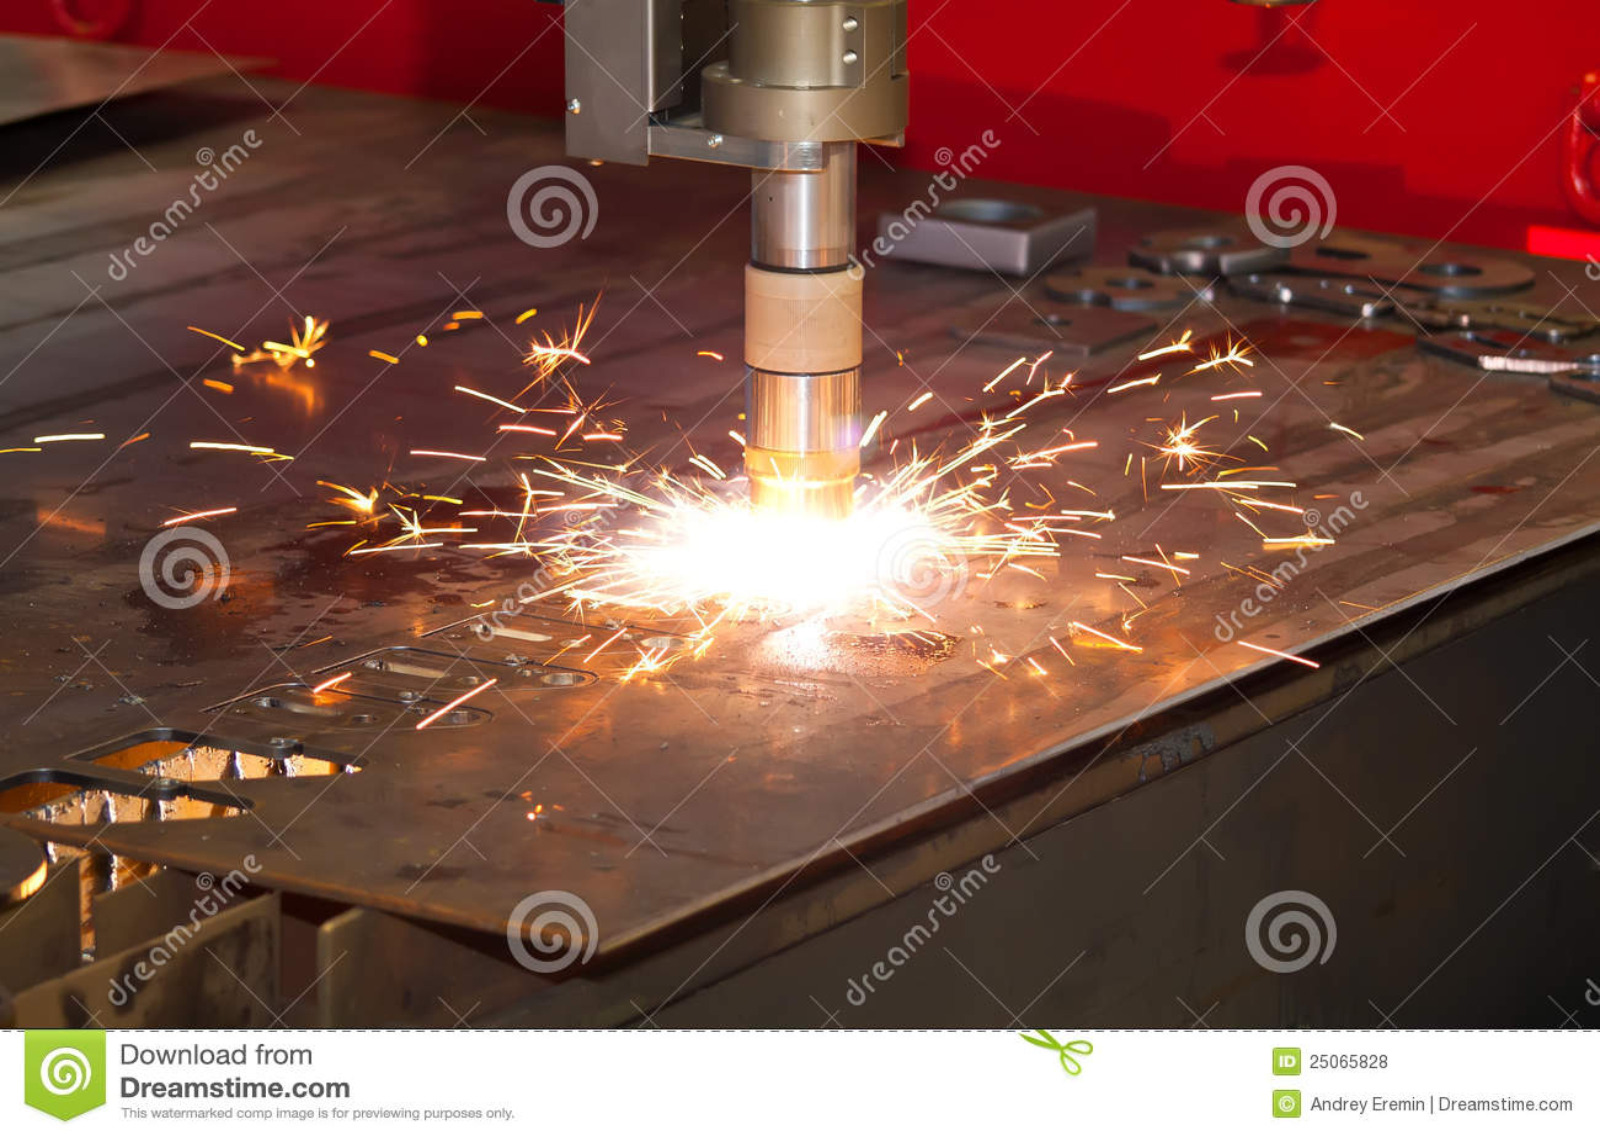 Plasma Cutter Stock Photo Image Of Manufacturing